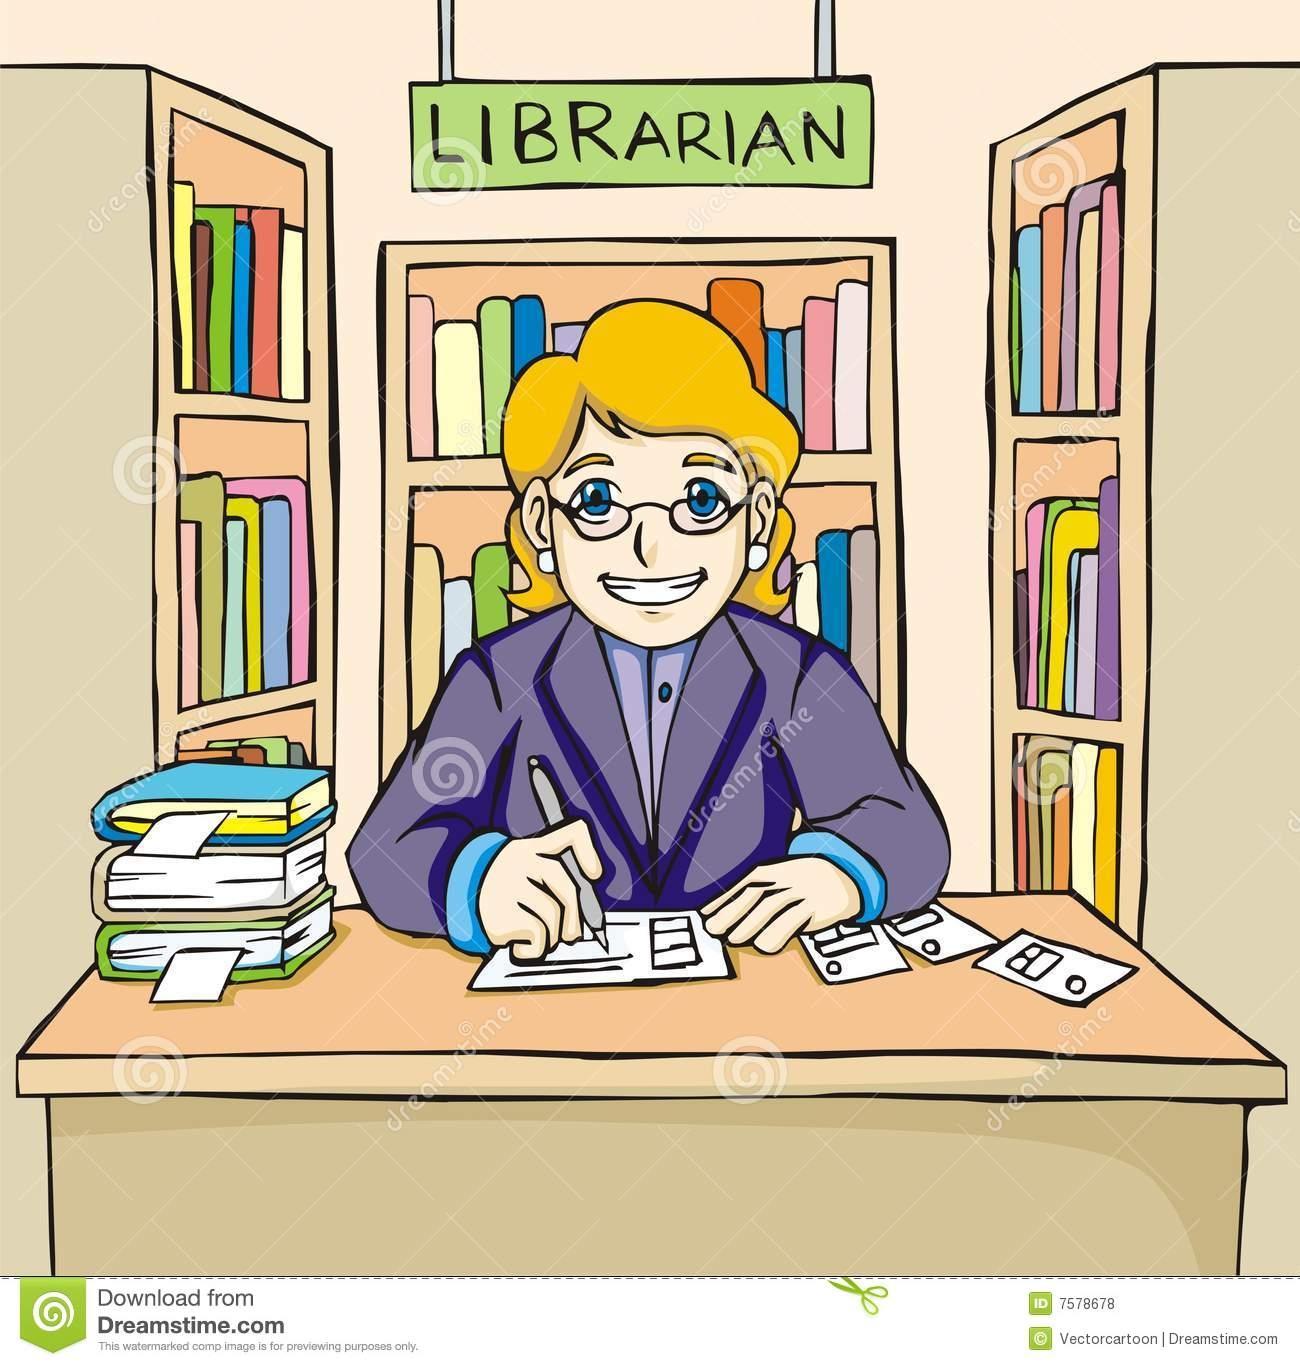 Librarian clipart. Fresh design digital collection